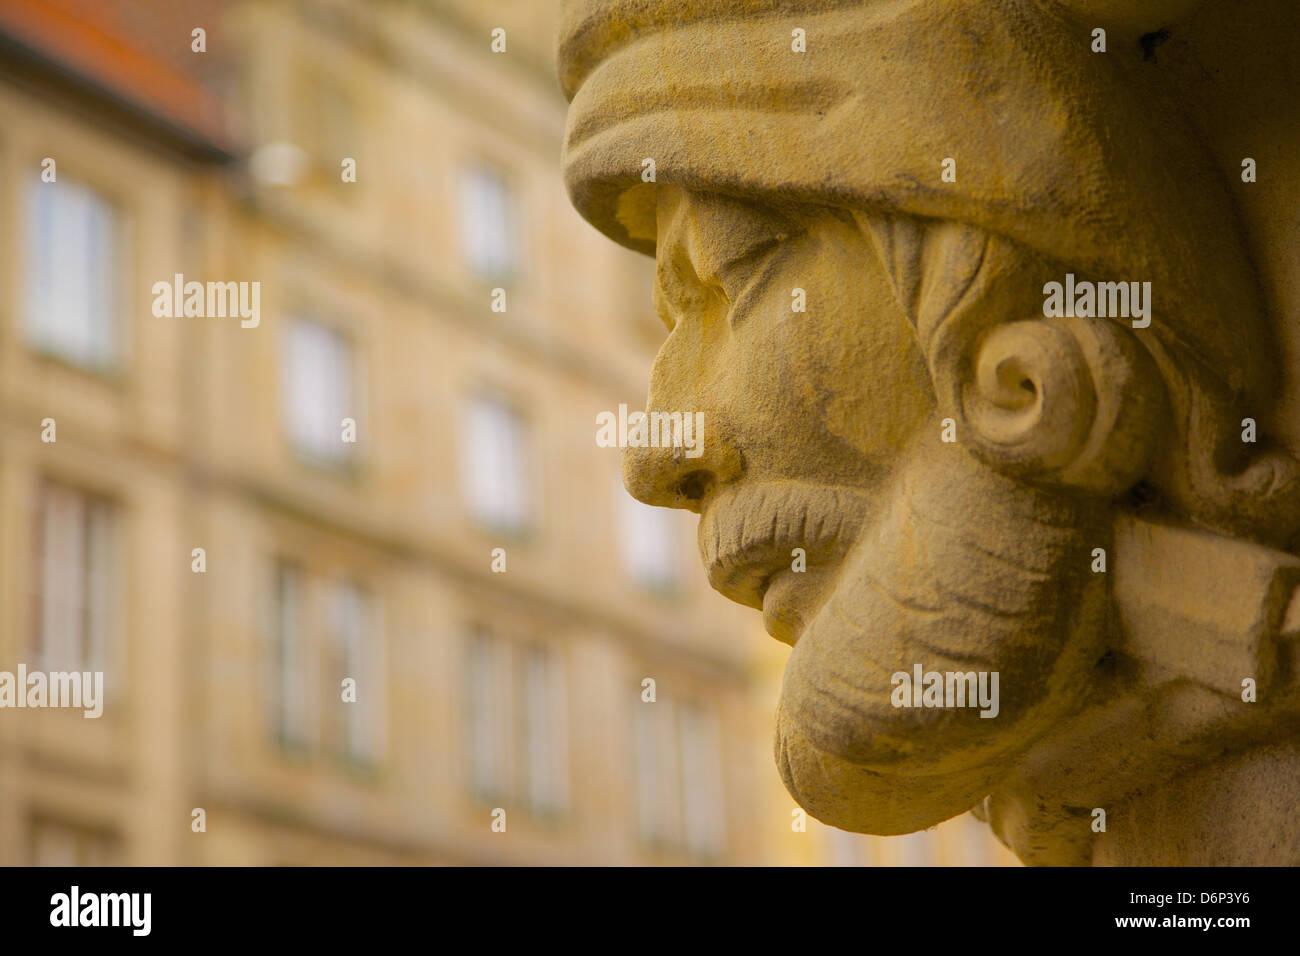 Stone carving on the Town Hall, Prinzipalmarkt, Munster, North Rhine-Westphalia, Germany, Europe - Stock Image